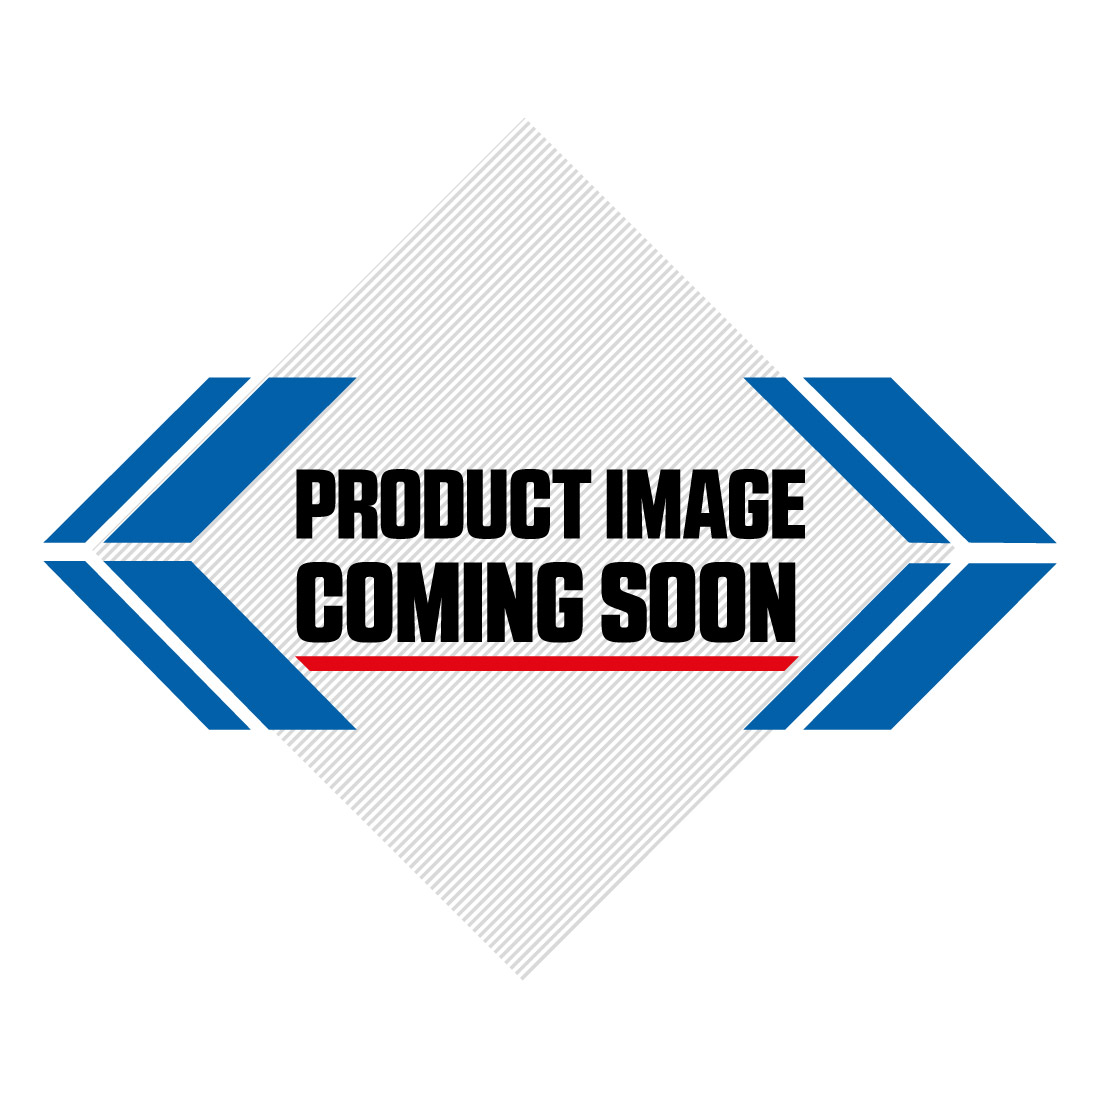 UFO KTM Plastic Kit SX 125 150 250 SXF 250 350 450 (16-18) White Image-5>